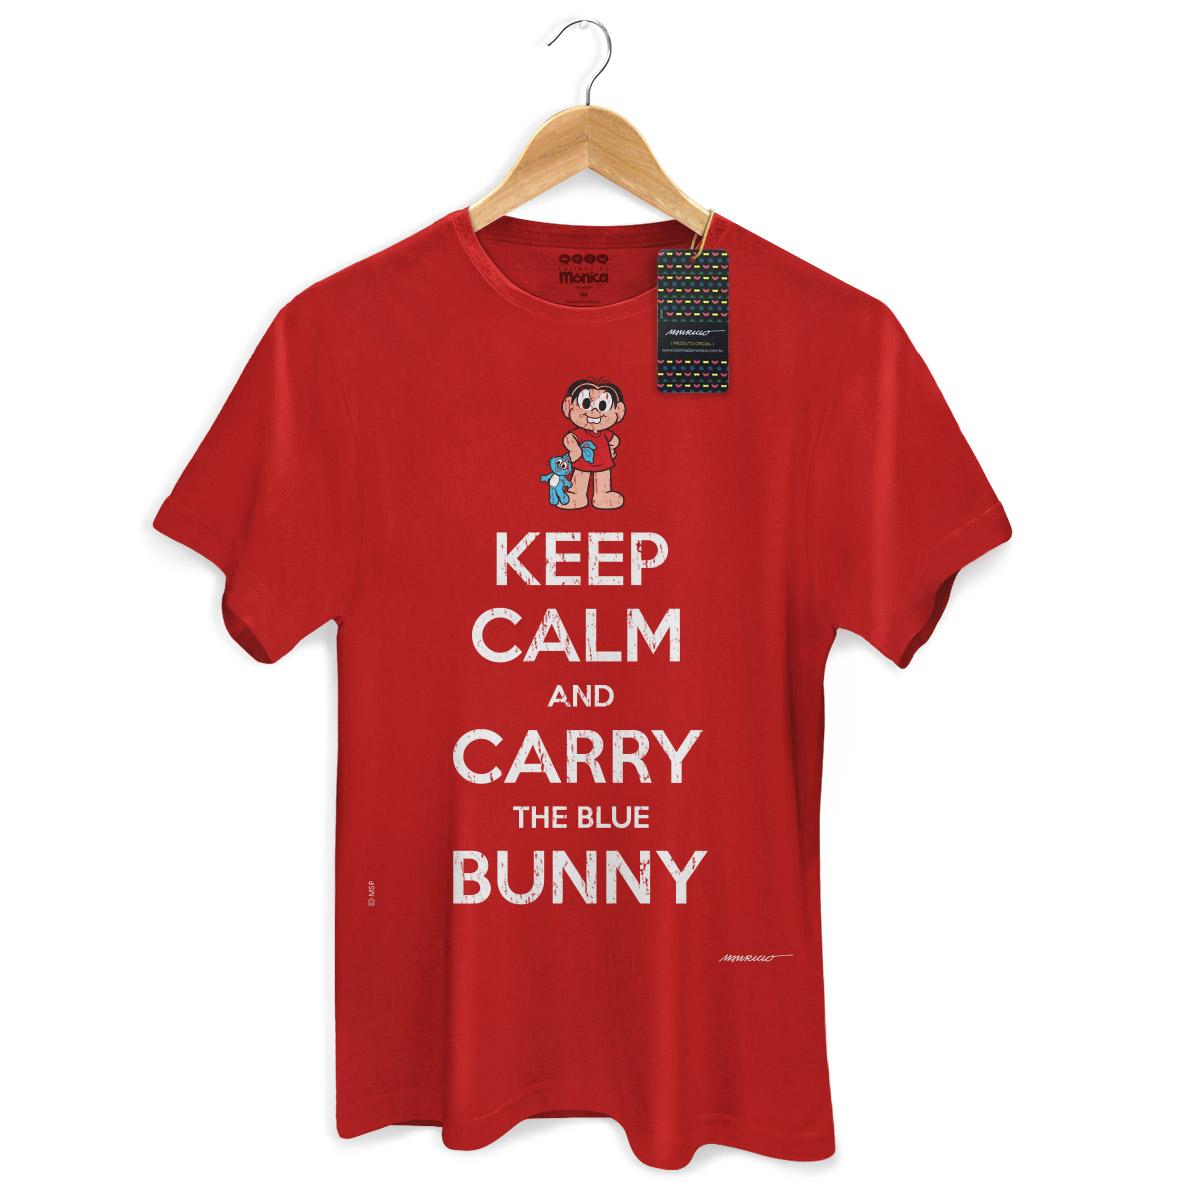 Camiseta Masculina Turma Da Mônica Cool Keep Calm And Carry The Blue Bunny